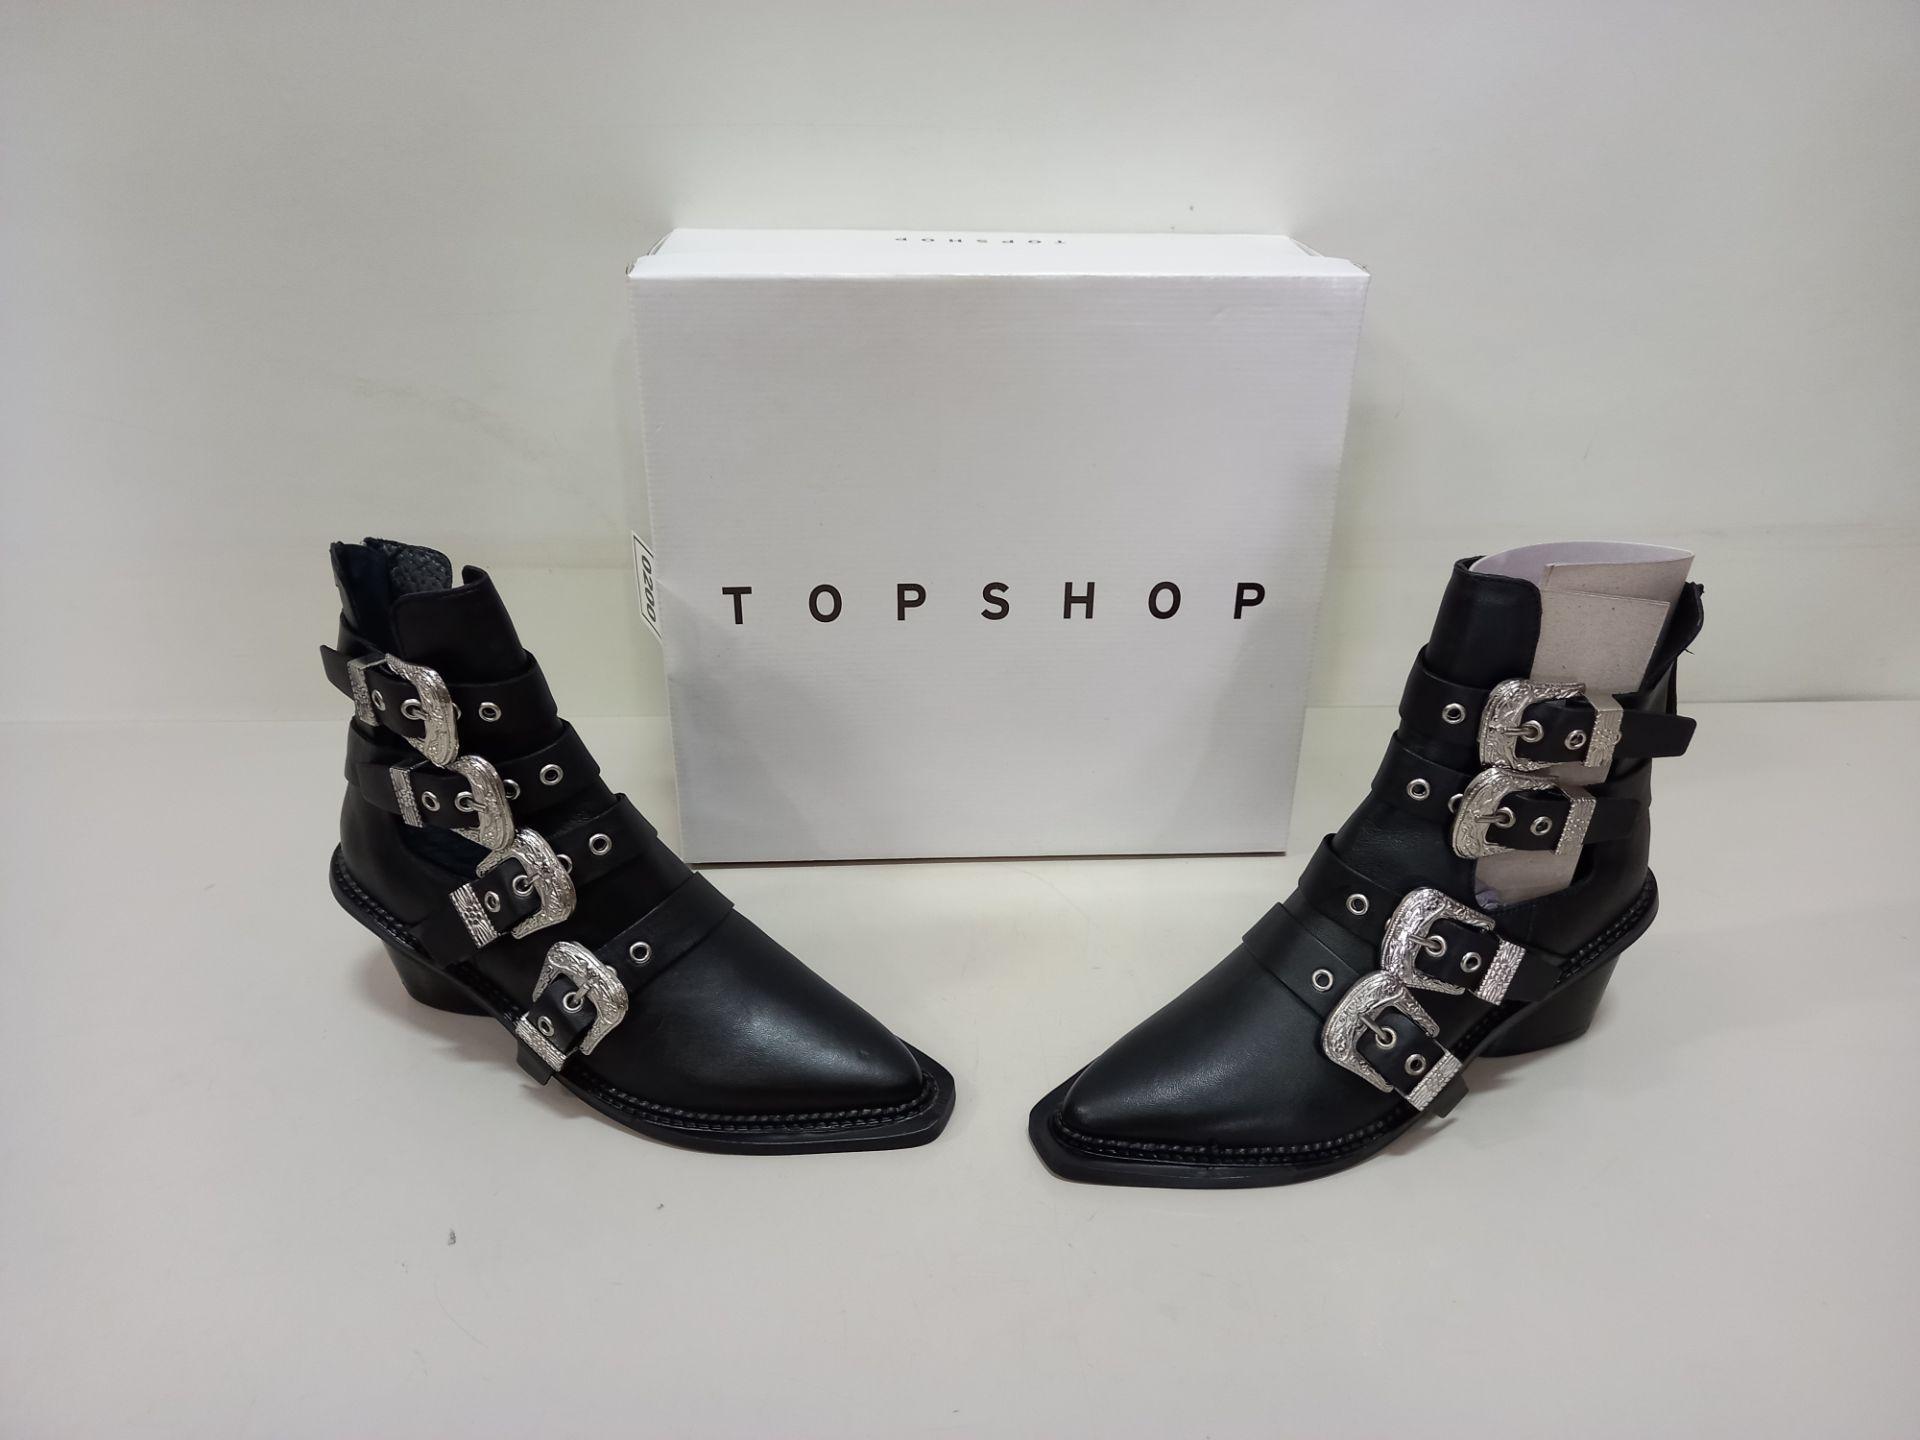 7 X BRAND NEW TOPSHOP MAGIC BLACK SHOES UK SIZE 6 RRP £85.00 (TOTAL RRP £595.00)